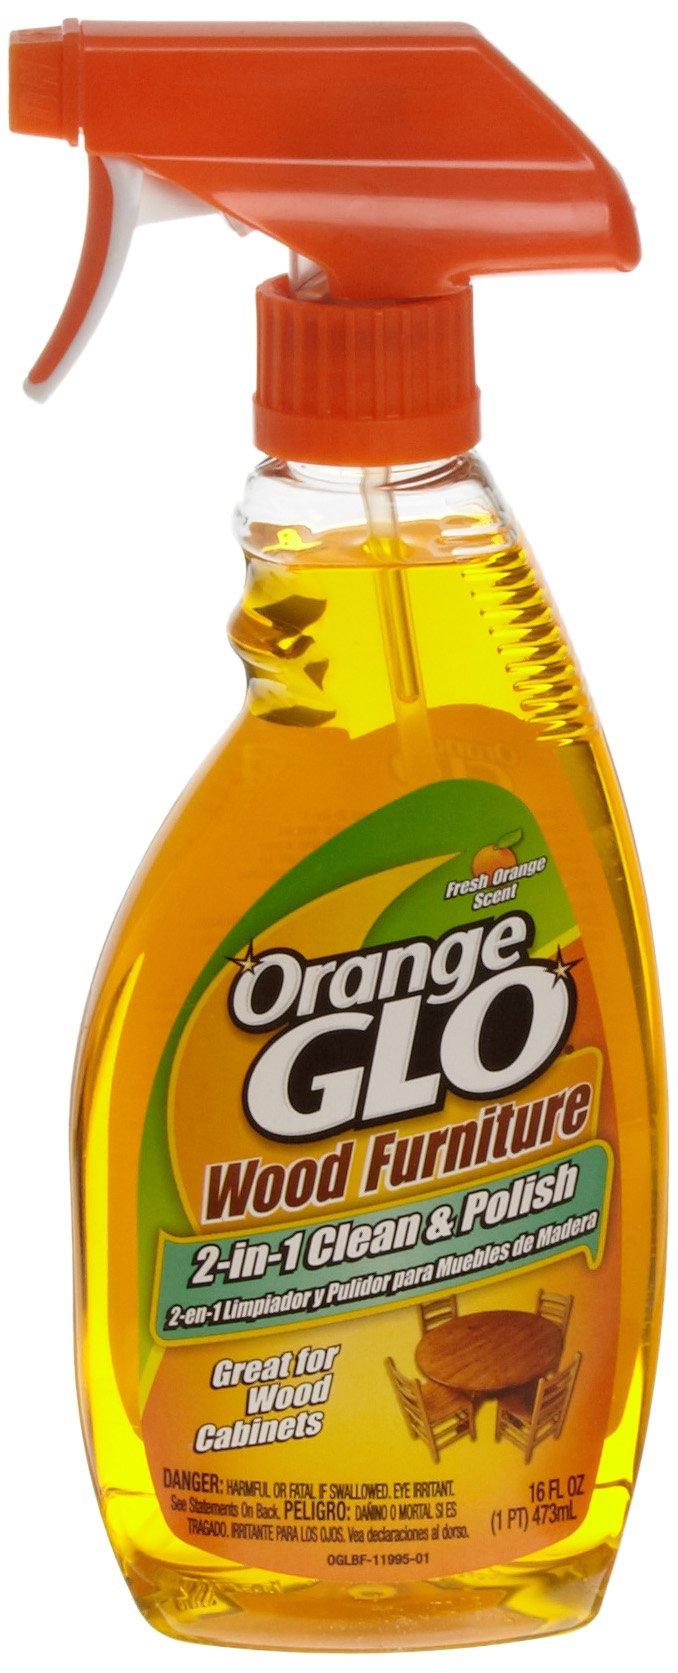 Orange Glo 57037-11897 16-Ounce Wood Furniture Polish (Case of 6)